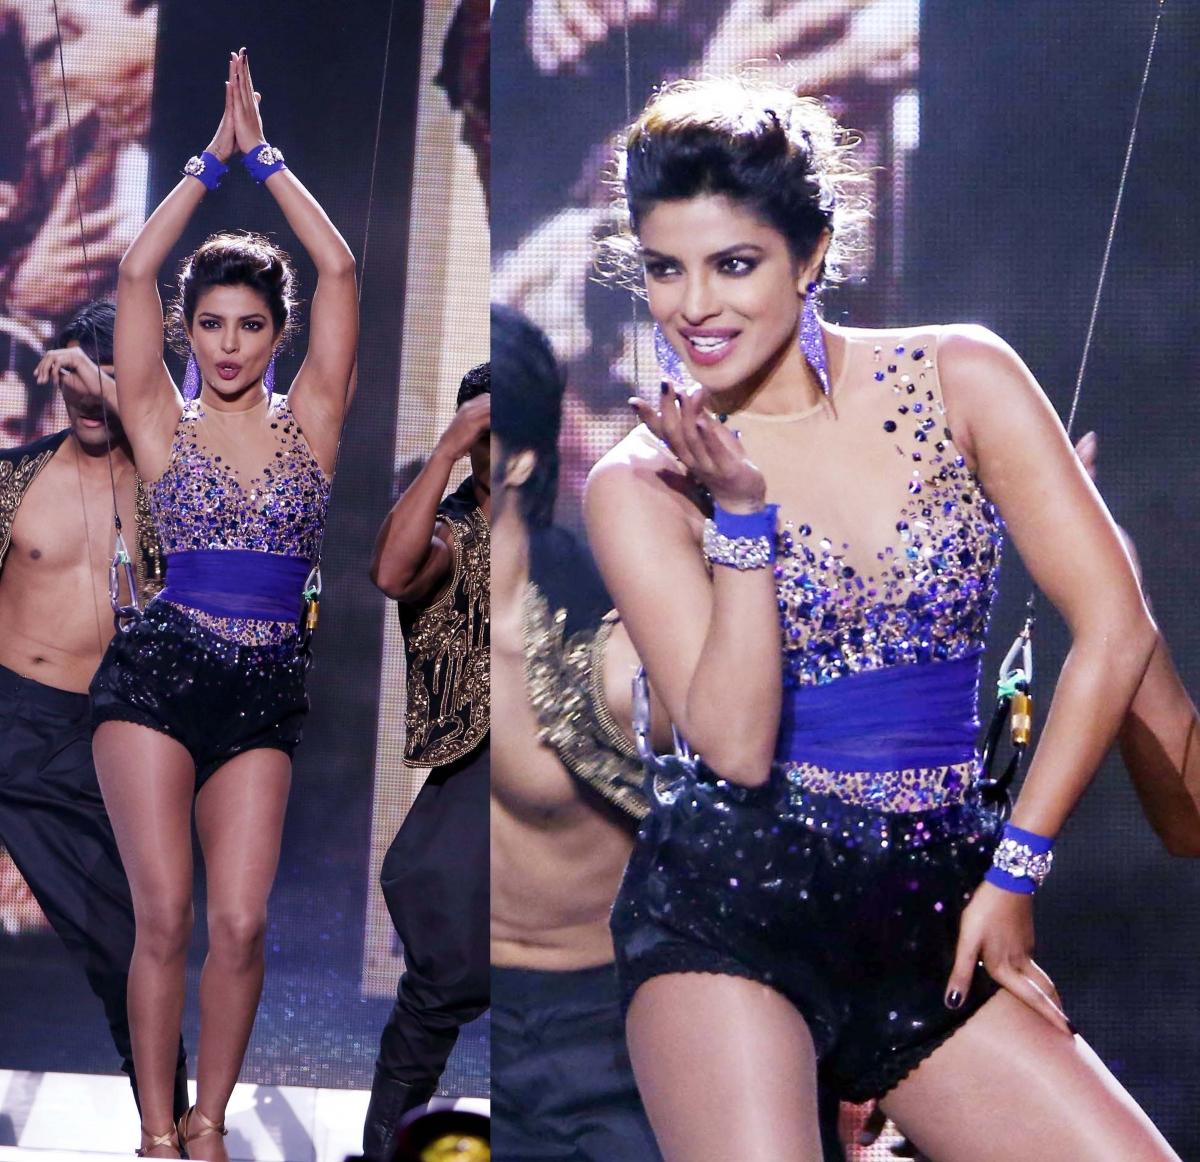 Travolta dances Indian dance with Priyanka Chopra. How is he good